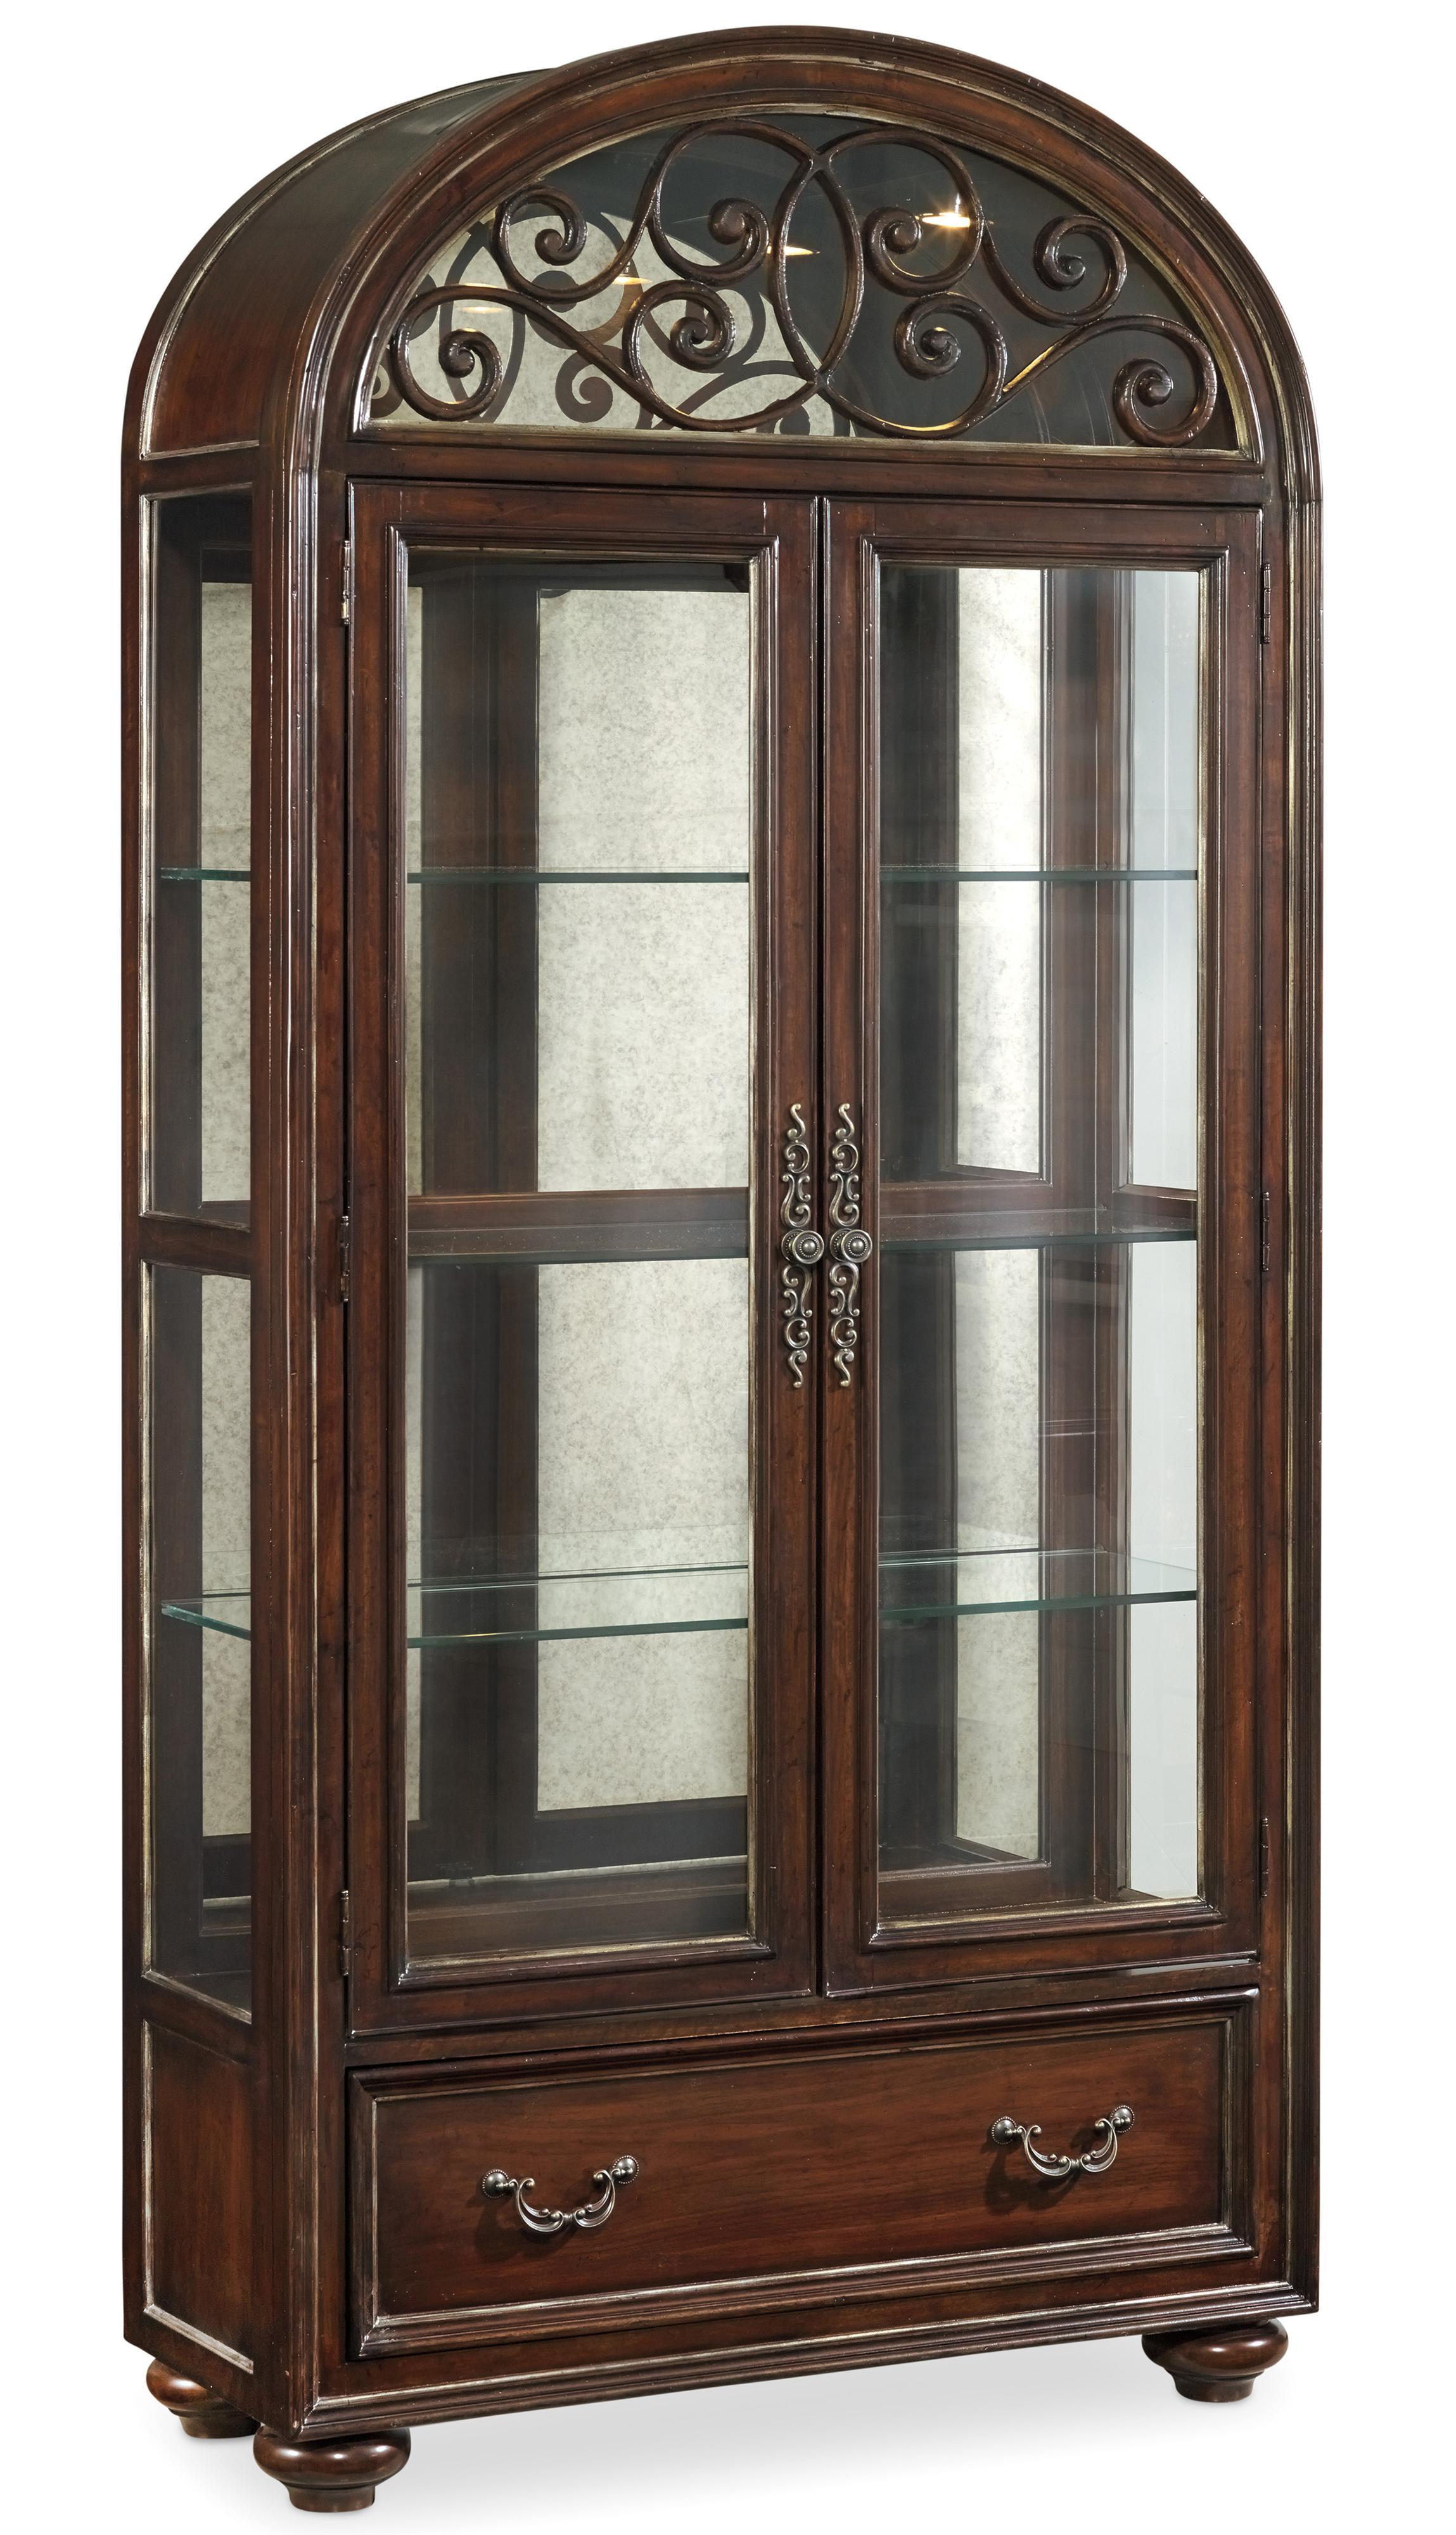 Hooker Furniture Grand Palais Display Cabinet - Item Number: 5272-75906